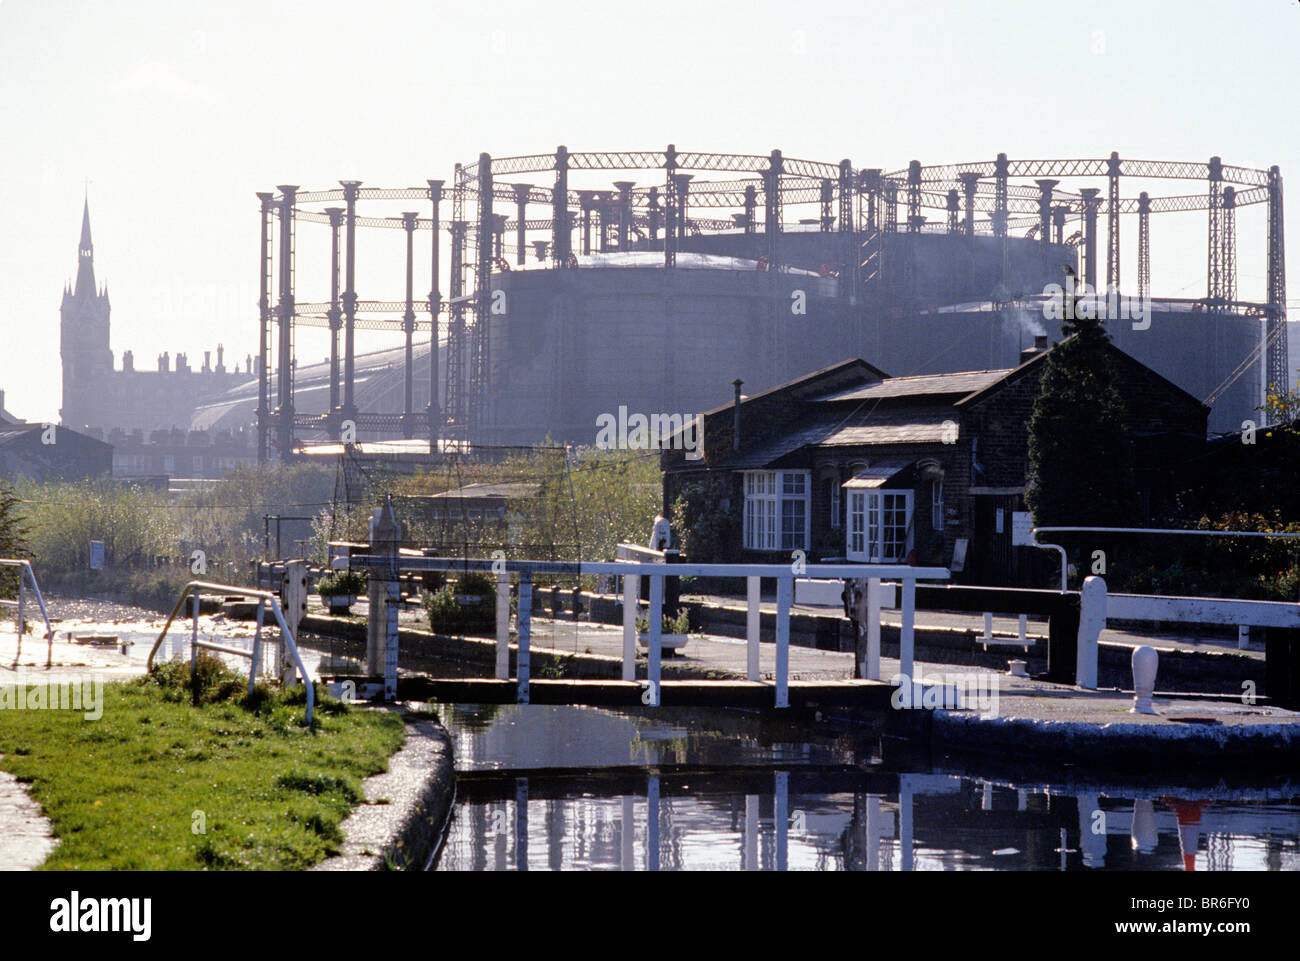 St. Pancras Lock, Regents Canal, Camley Street Gas Holders London England UK gasometer gasometers holders English Stock Photo